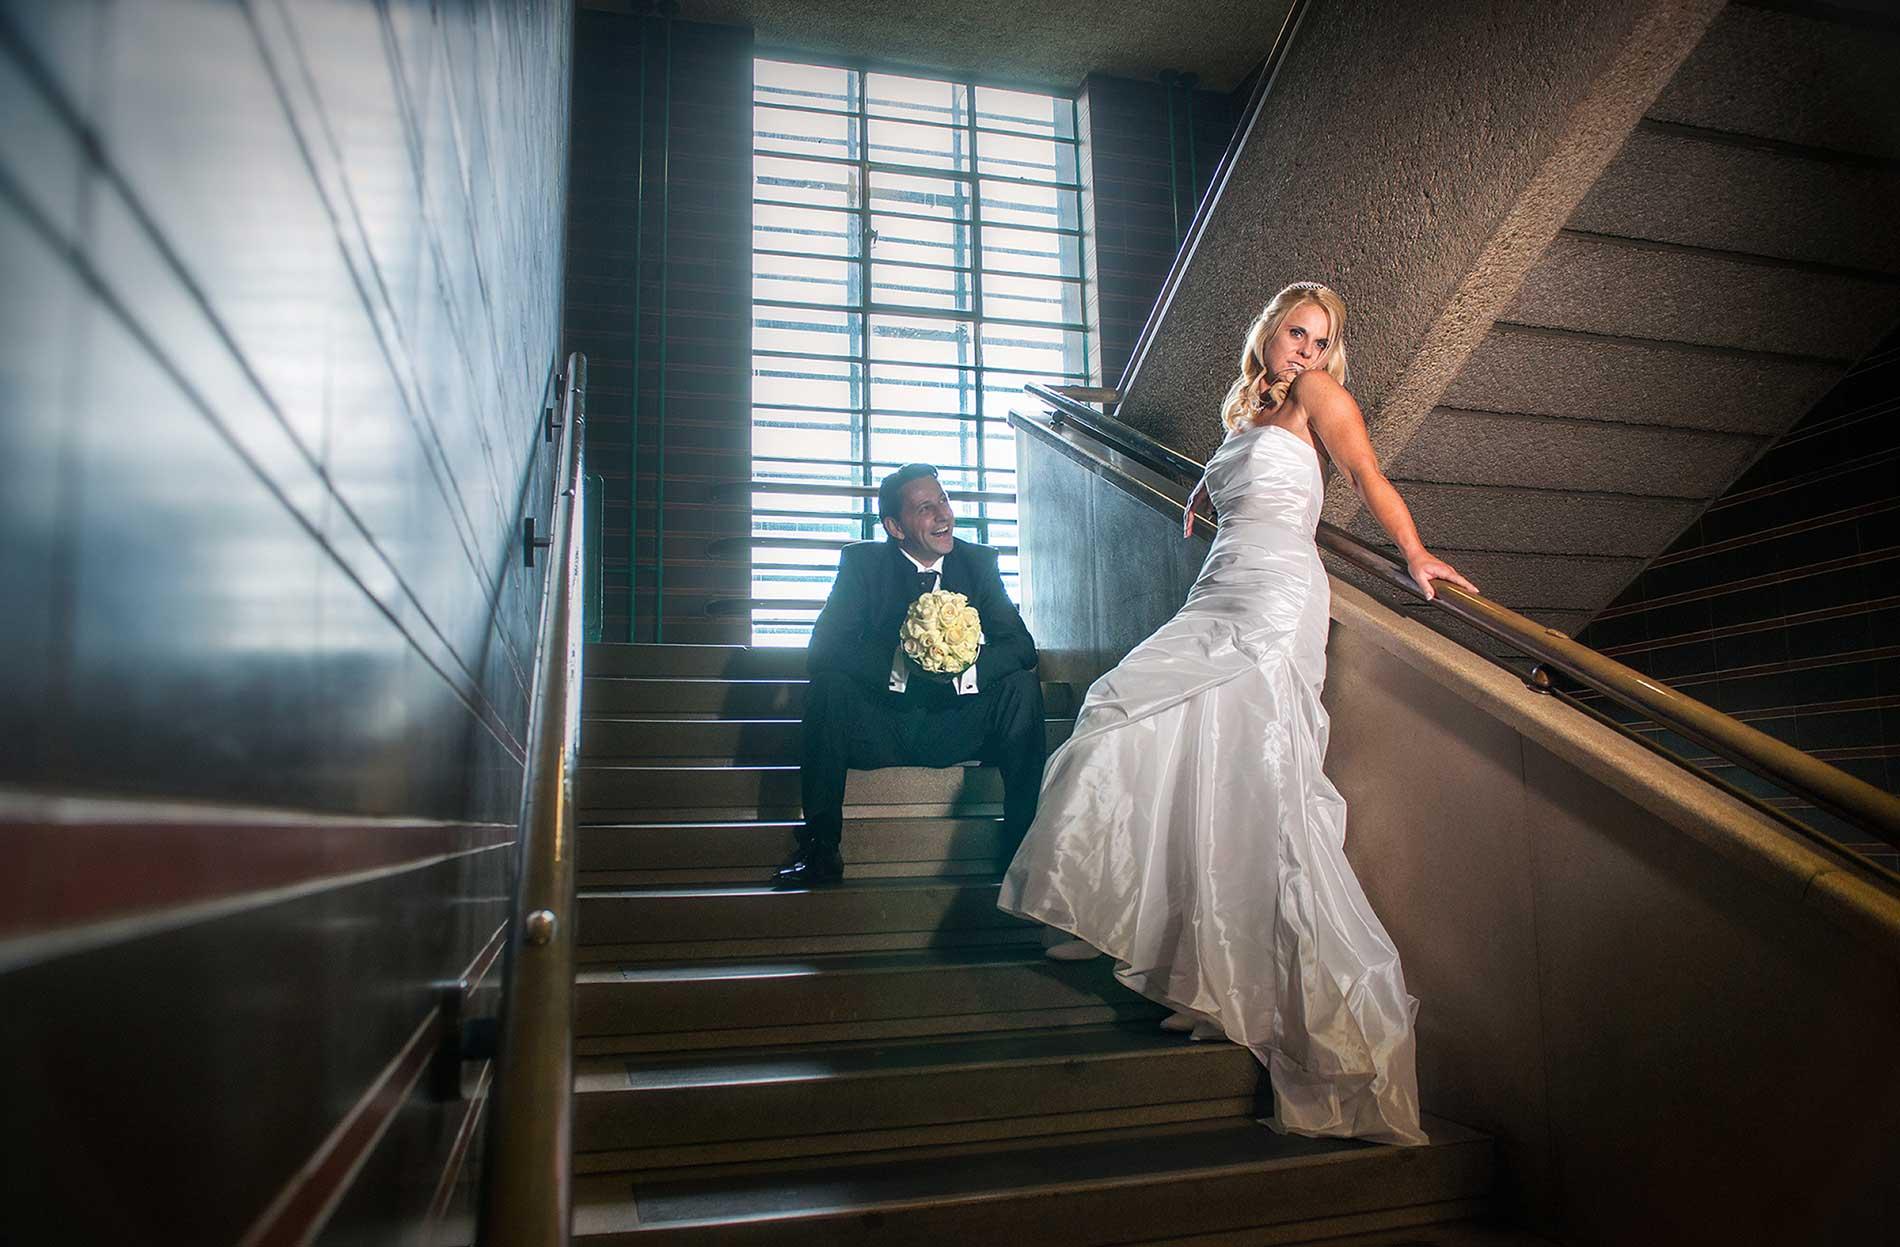 svatebni fotografie wedding in Cesky Krumlov linz trebon ceske budejovice jihocesky kraj jizni cechy svatebni fotograf potret tehotenske foto svatby 1